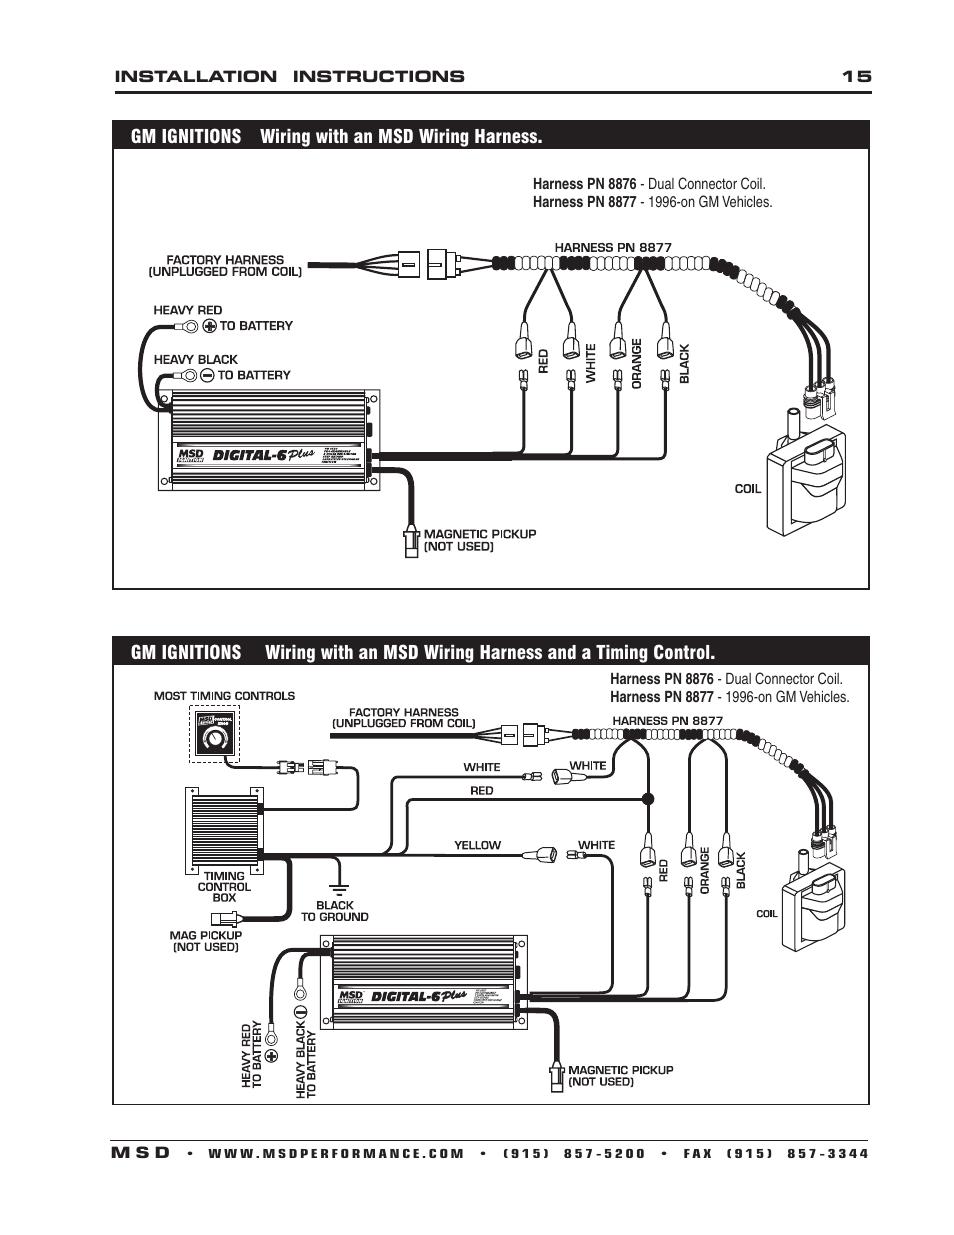 Msd Digital 7 Wiring Diagram - Wiring Diagram Database on msd 6al 2 wiring diagram, msd 6al box wiring diagram, distributor hei wiring diagram, msd 6al tach wiring diagram,